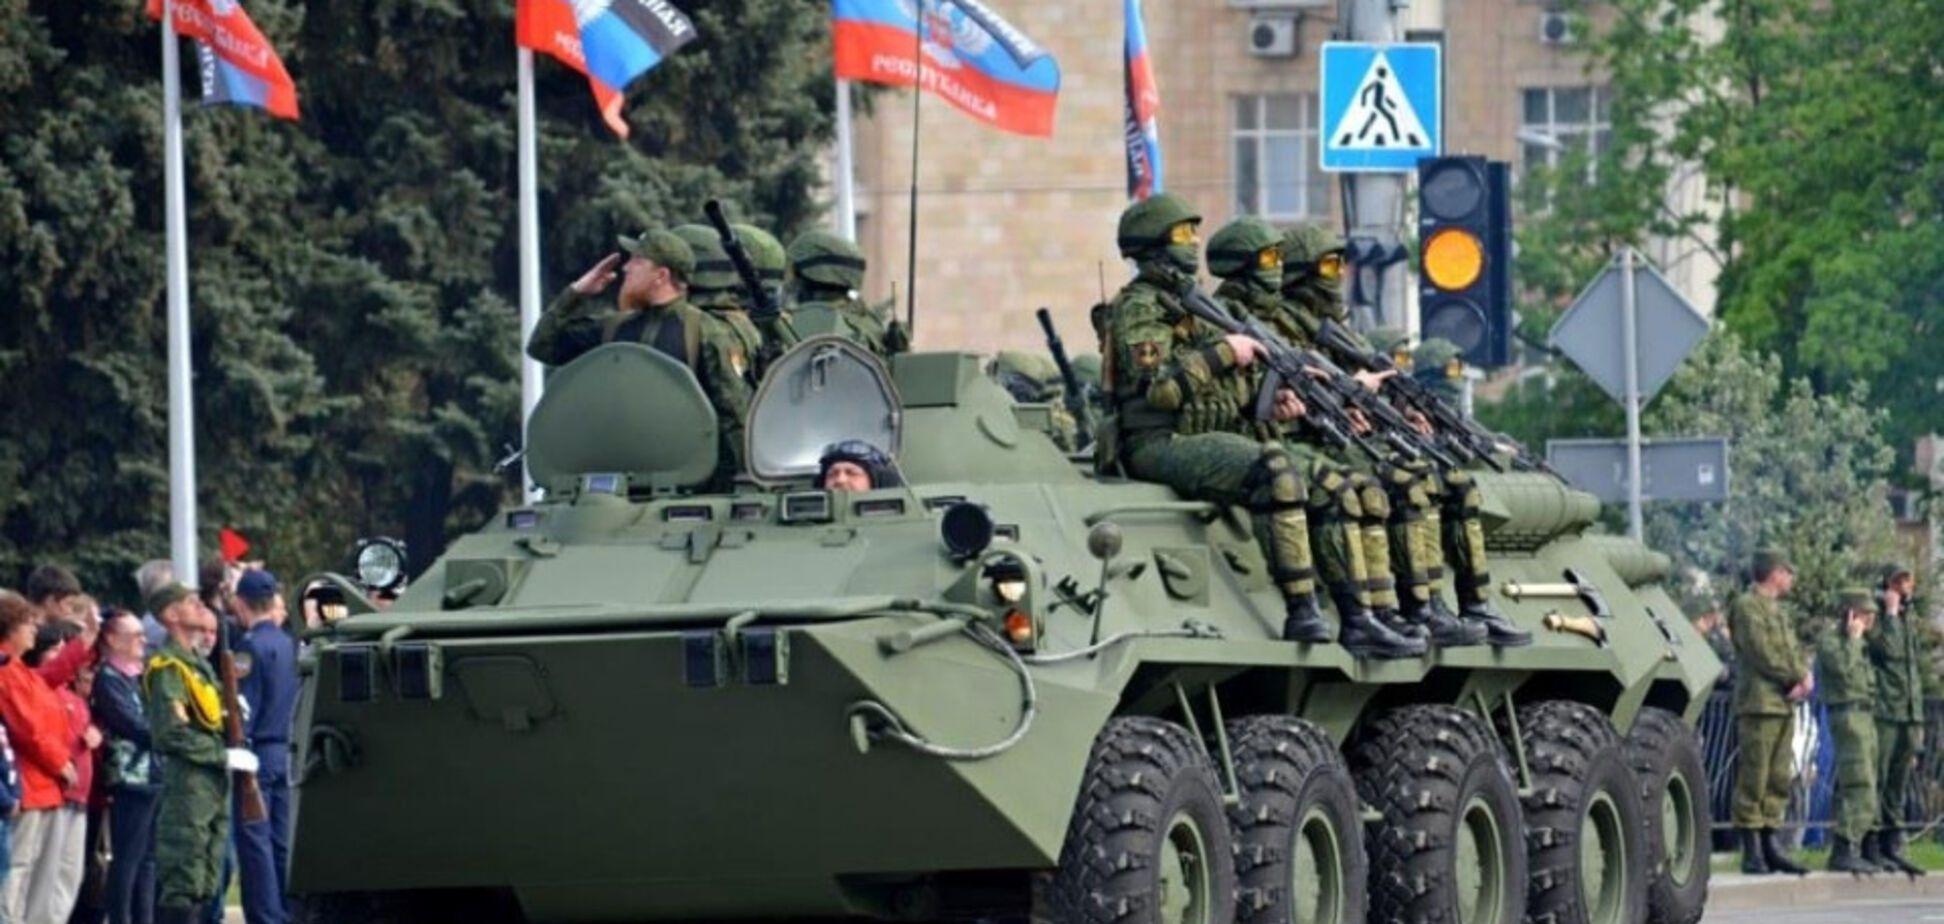 Скандал с парадом 'ДНР': в Раде придумали наказание